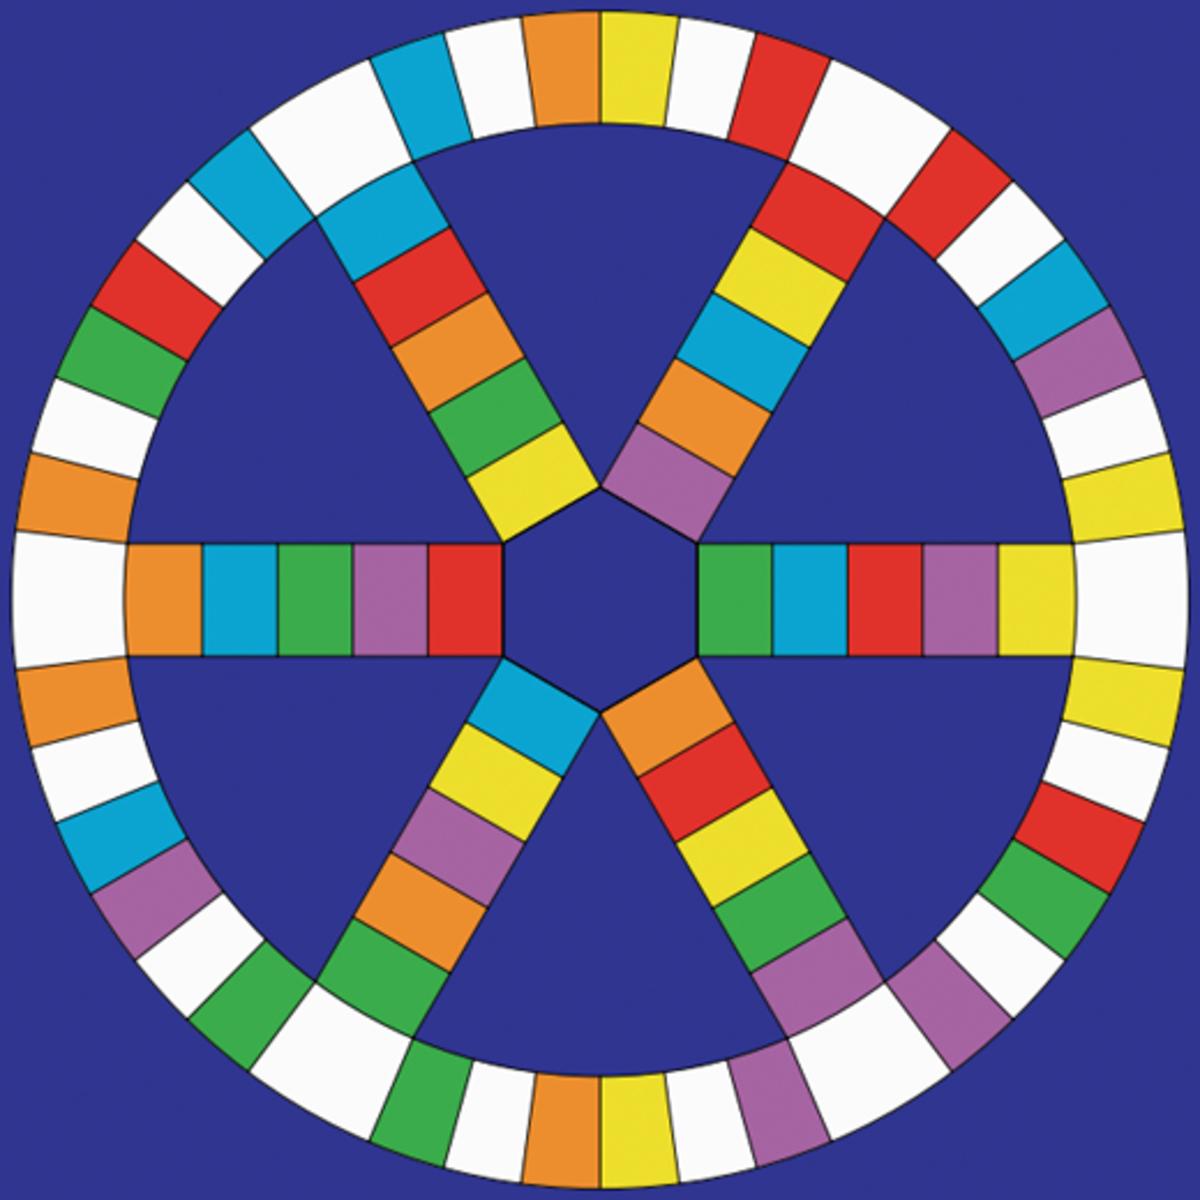 Blank Trivial Pursuit board.